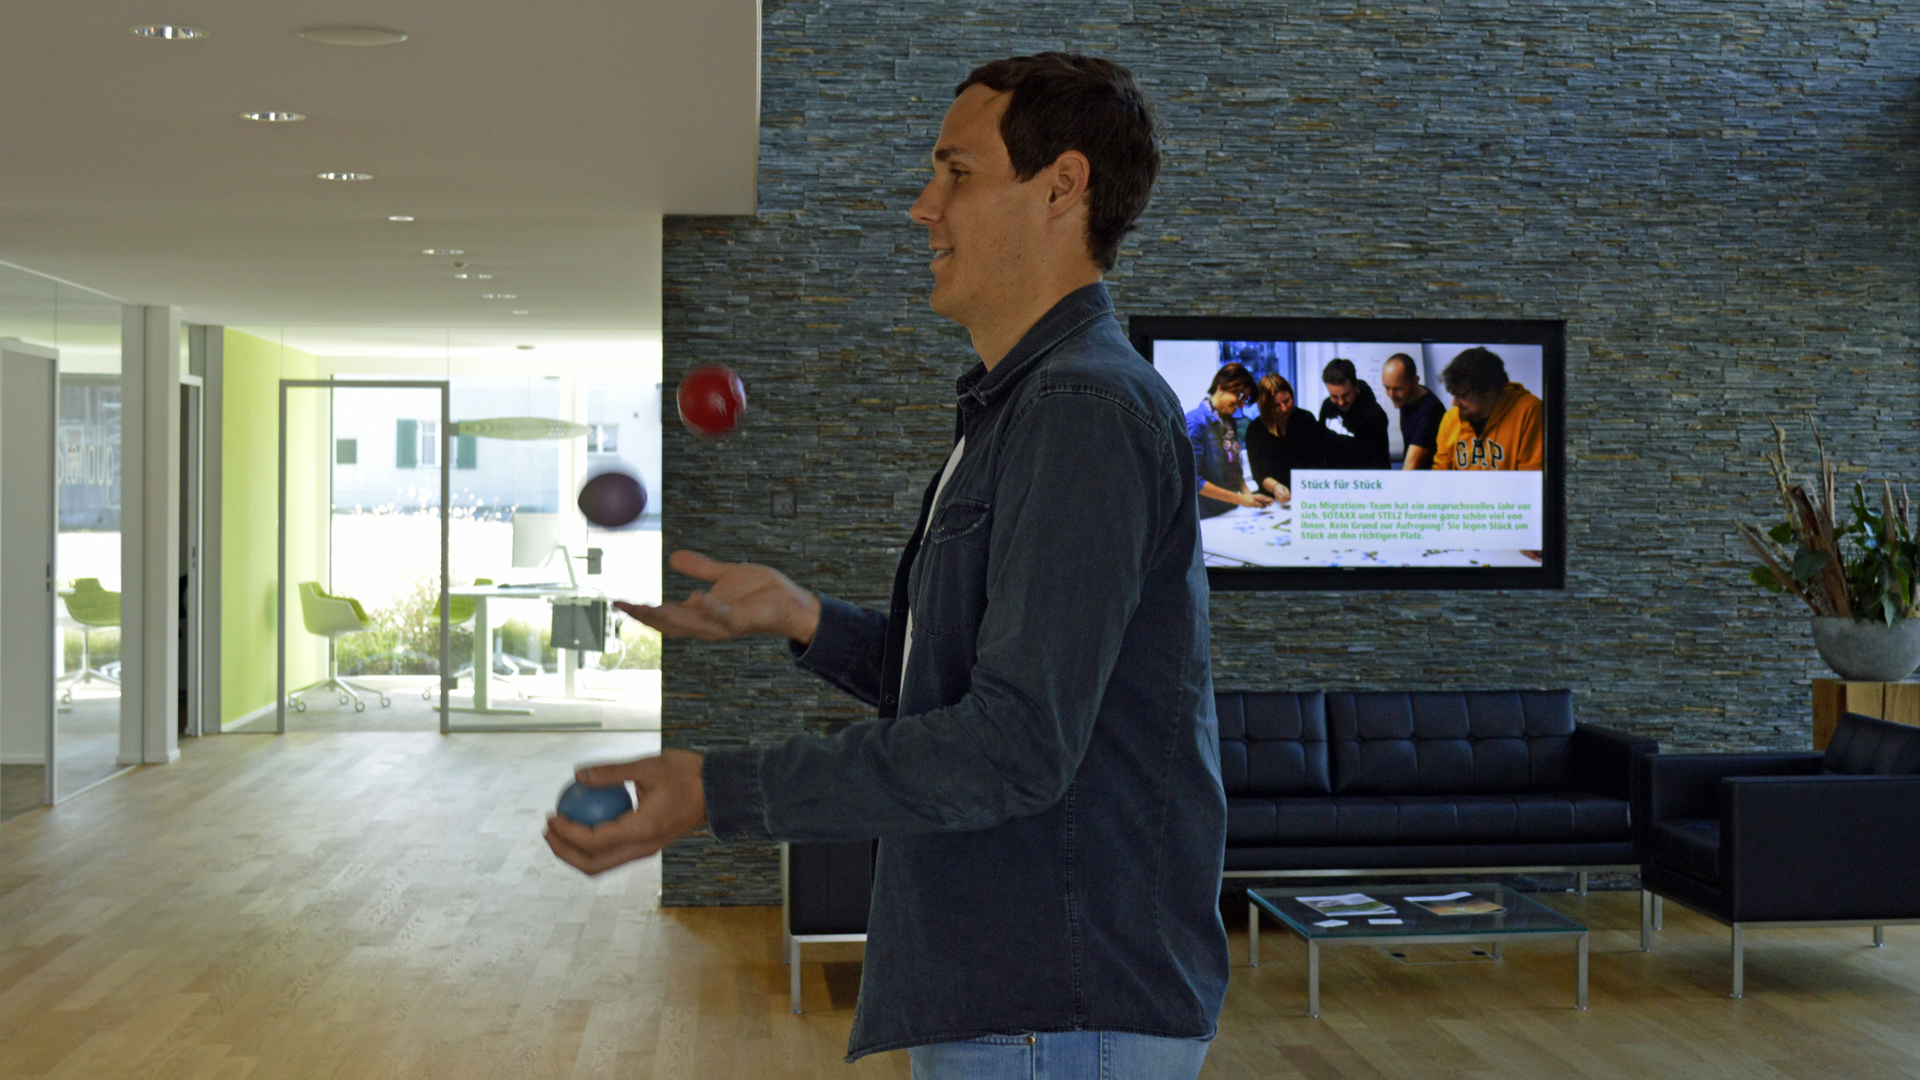 Andreas jongliert mit Bällen